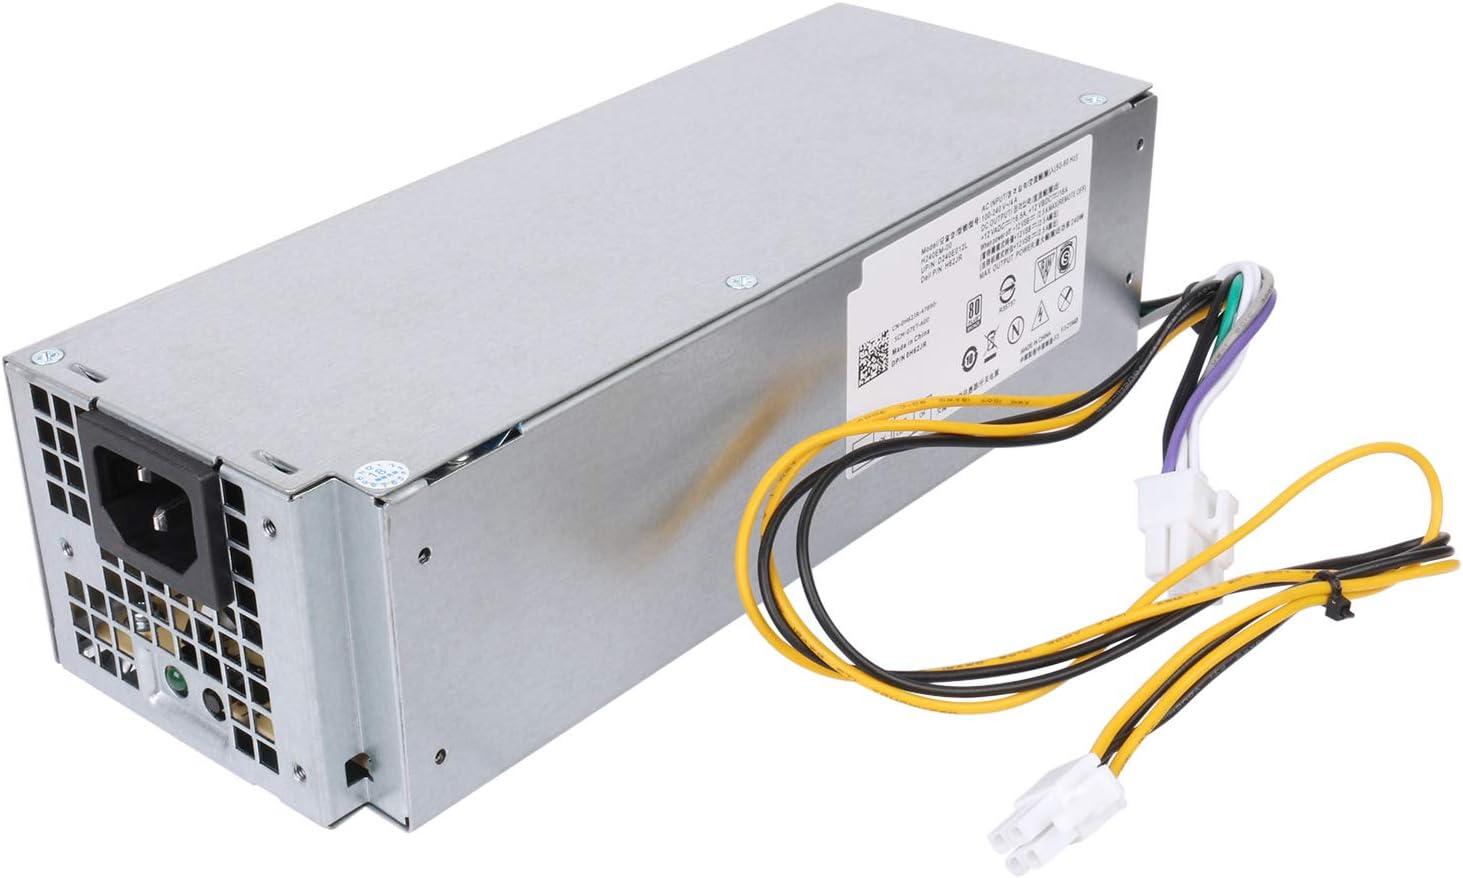 Li-SUN 240W Switching Power Supply for Dell Optiplex 3040 5040 7040 3650 3656 SFF(Part Number: THRJK 4GTN5 D7GX8 HGRMH 2P1RD H62JR 3RK5T)